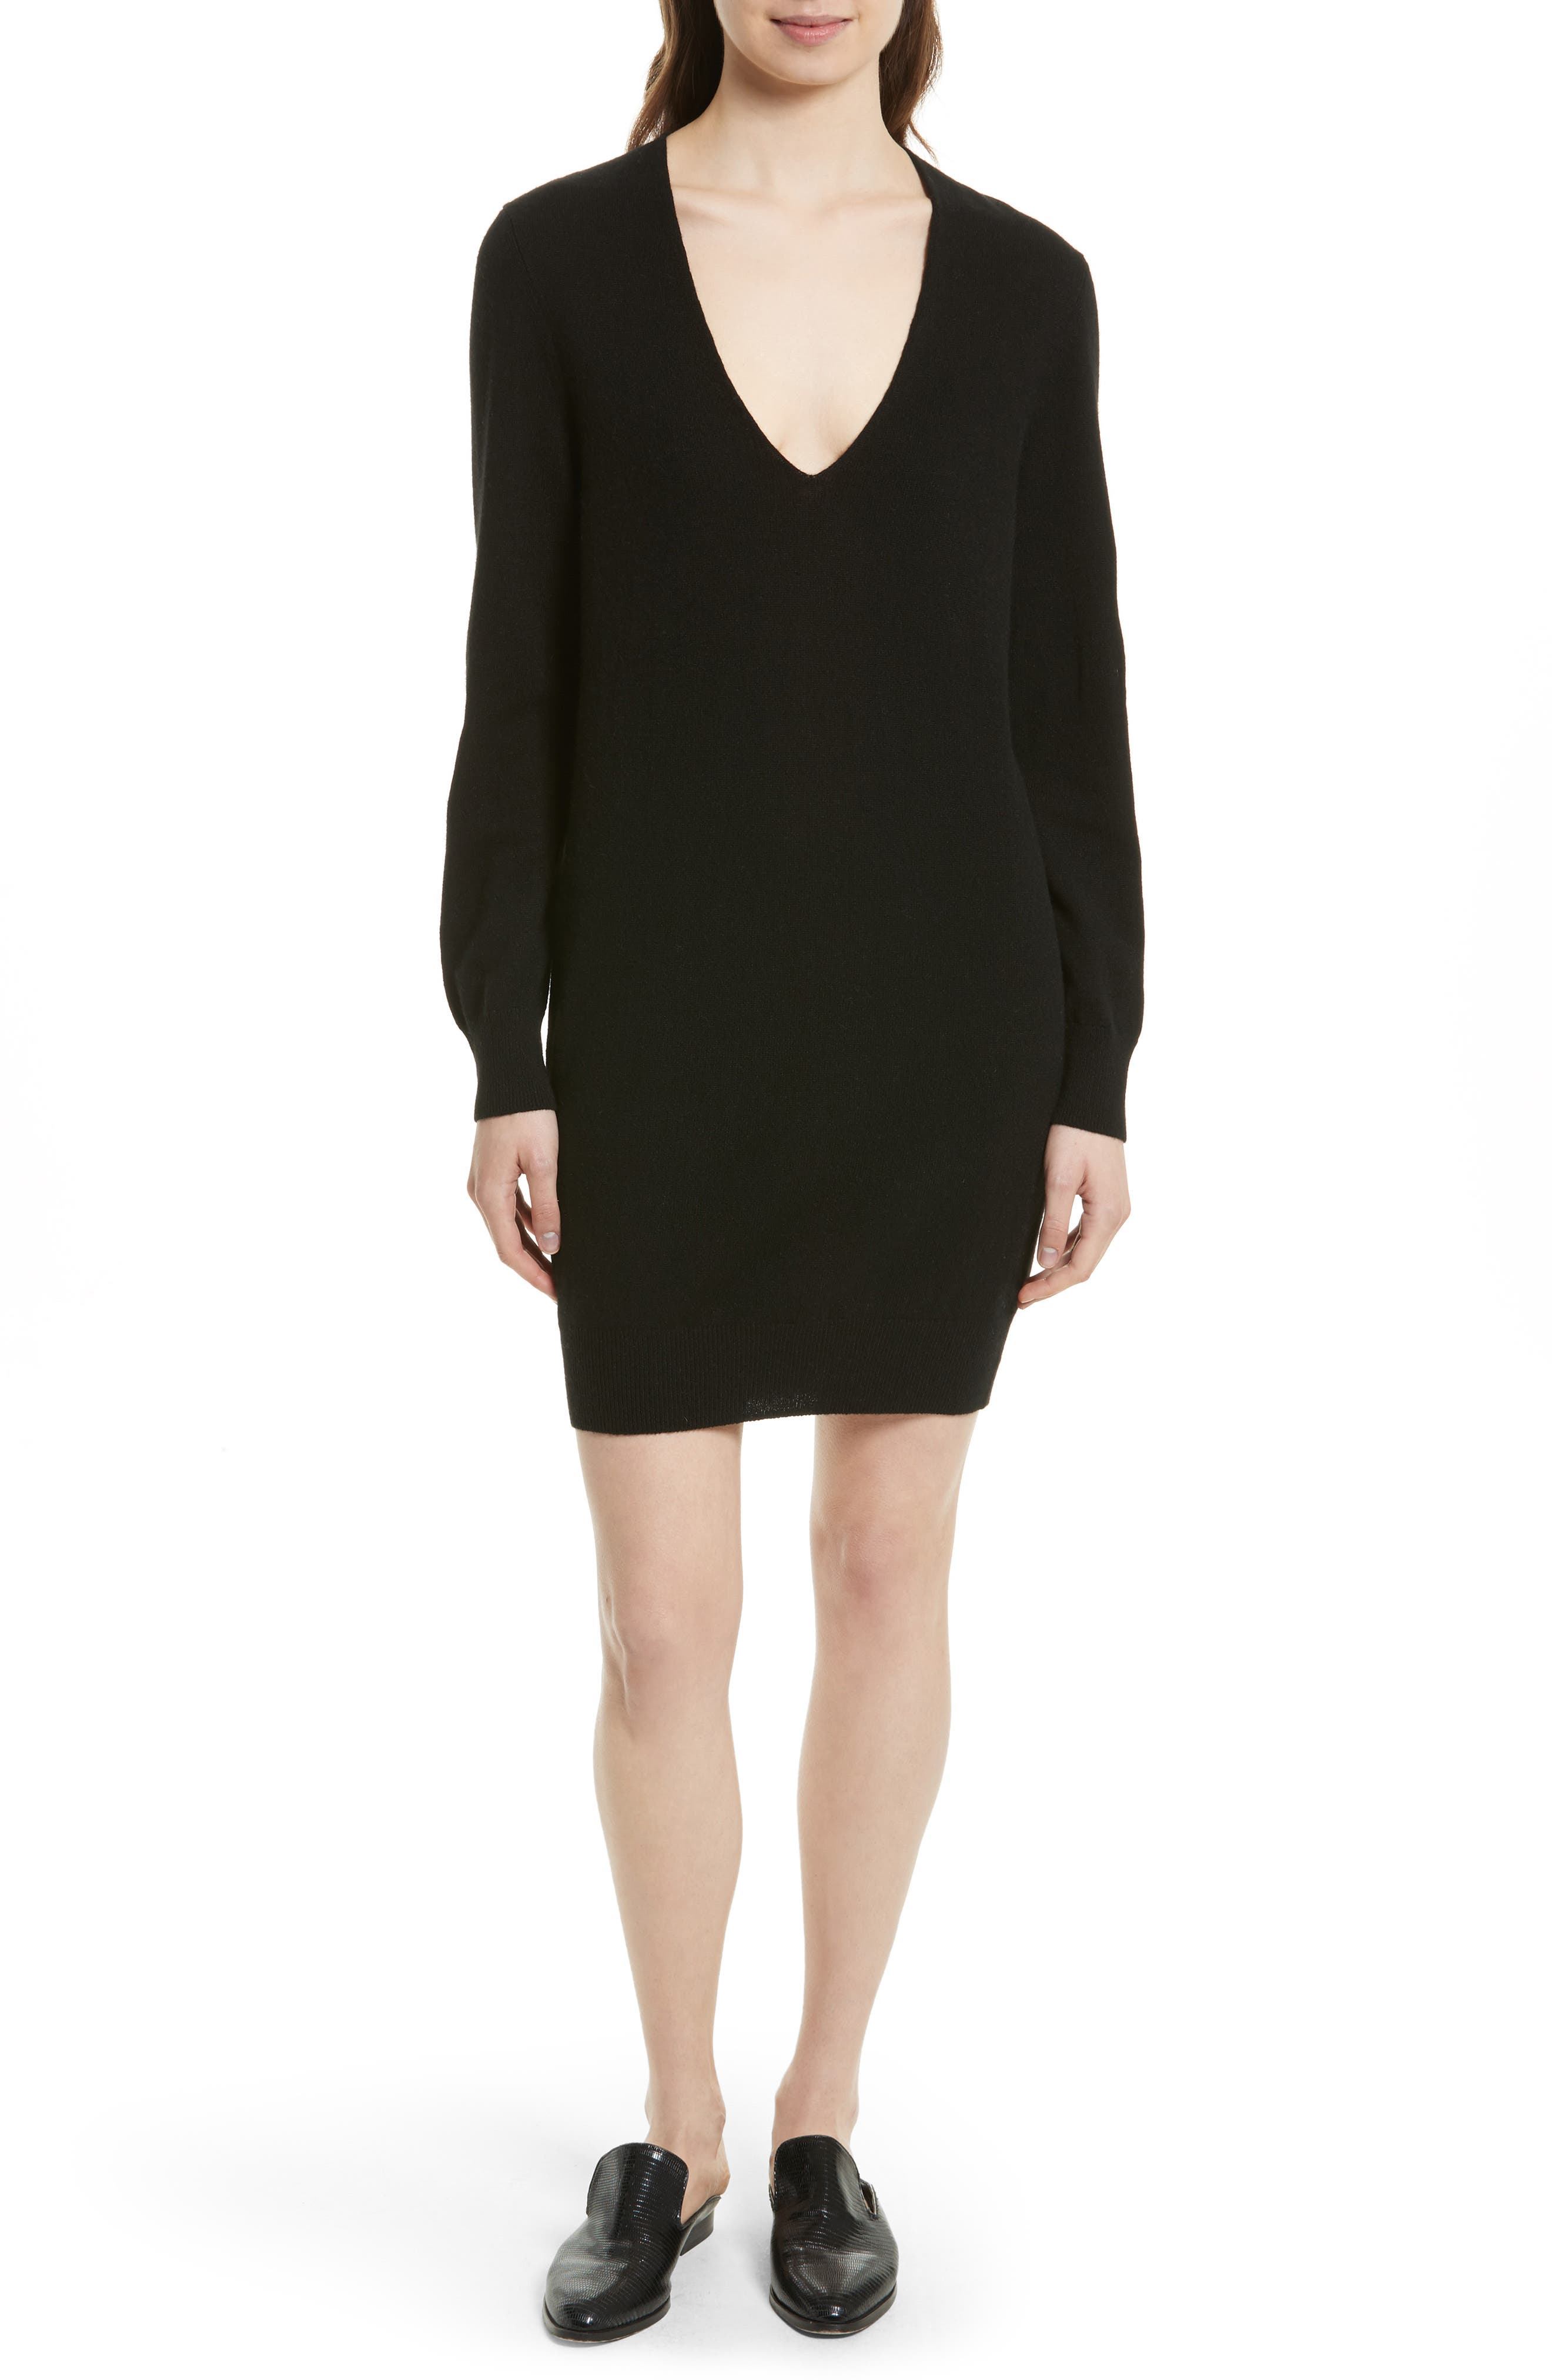 Main Image - Equipment Rosemary V-Neck Cashmere Sweater Dress